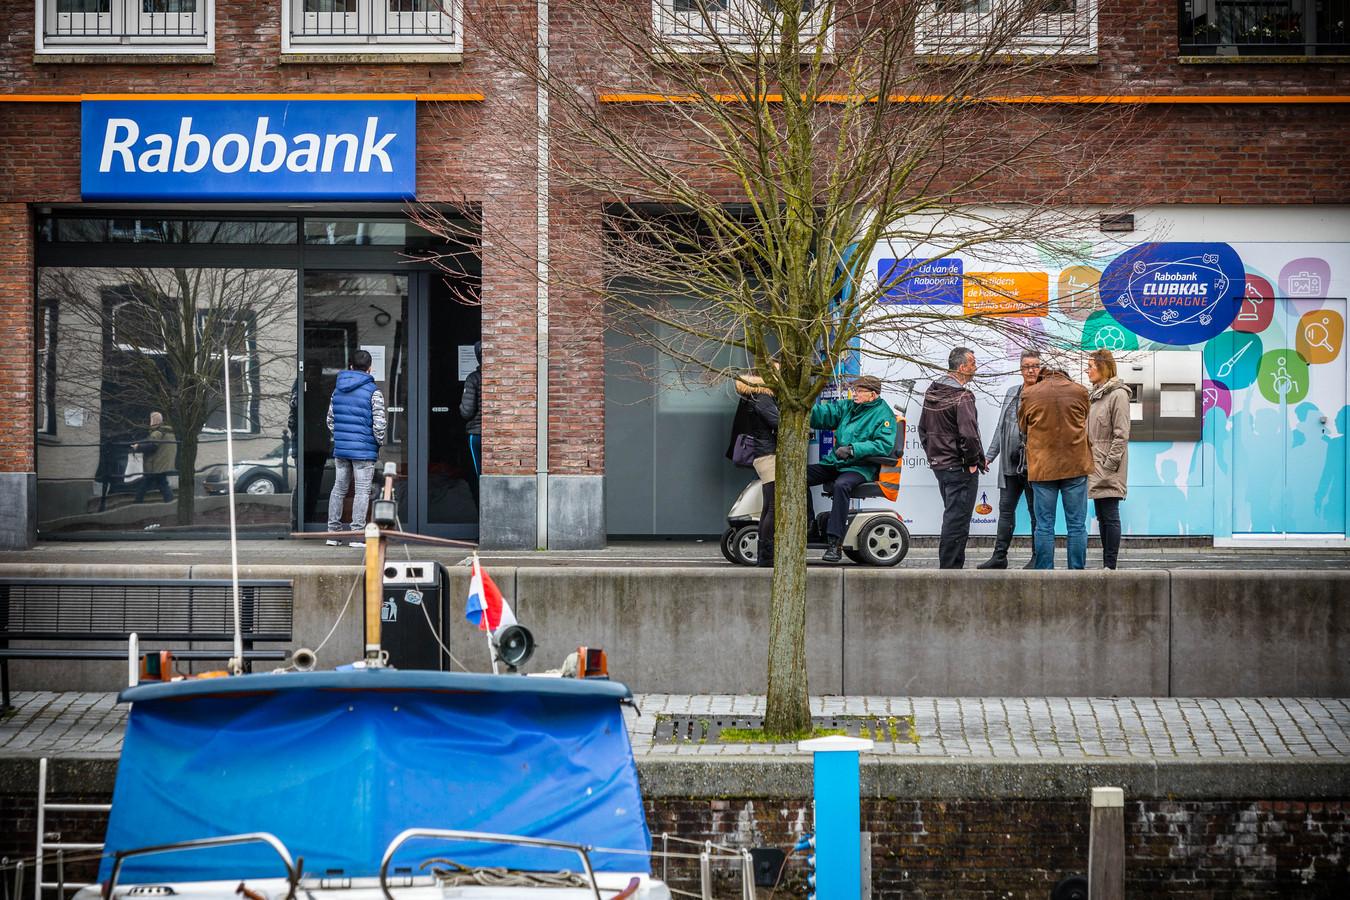 De Rabobank in Oudenbosch.